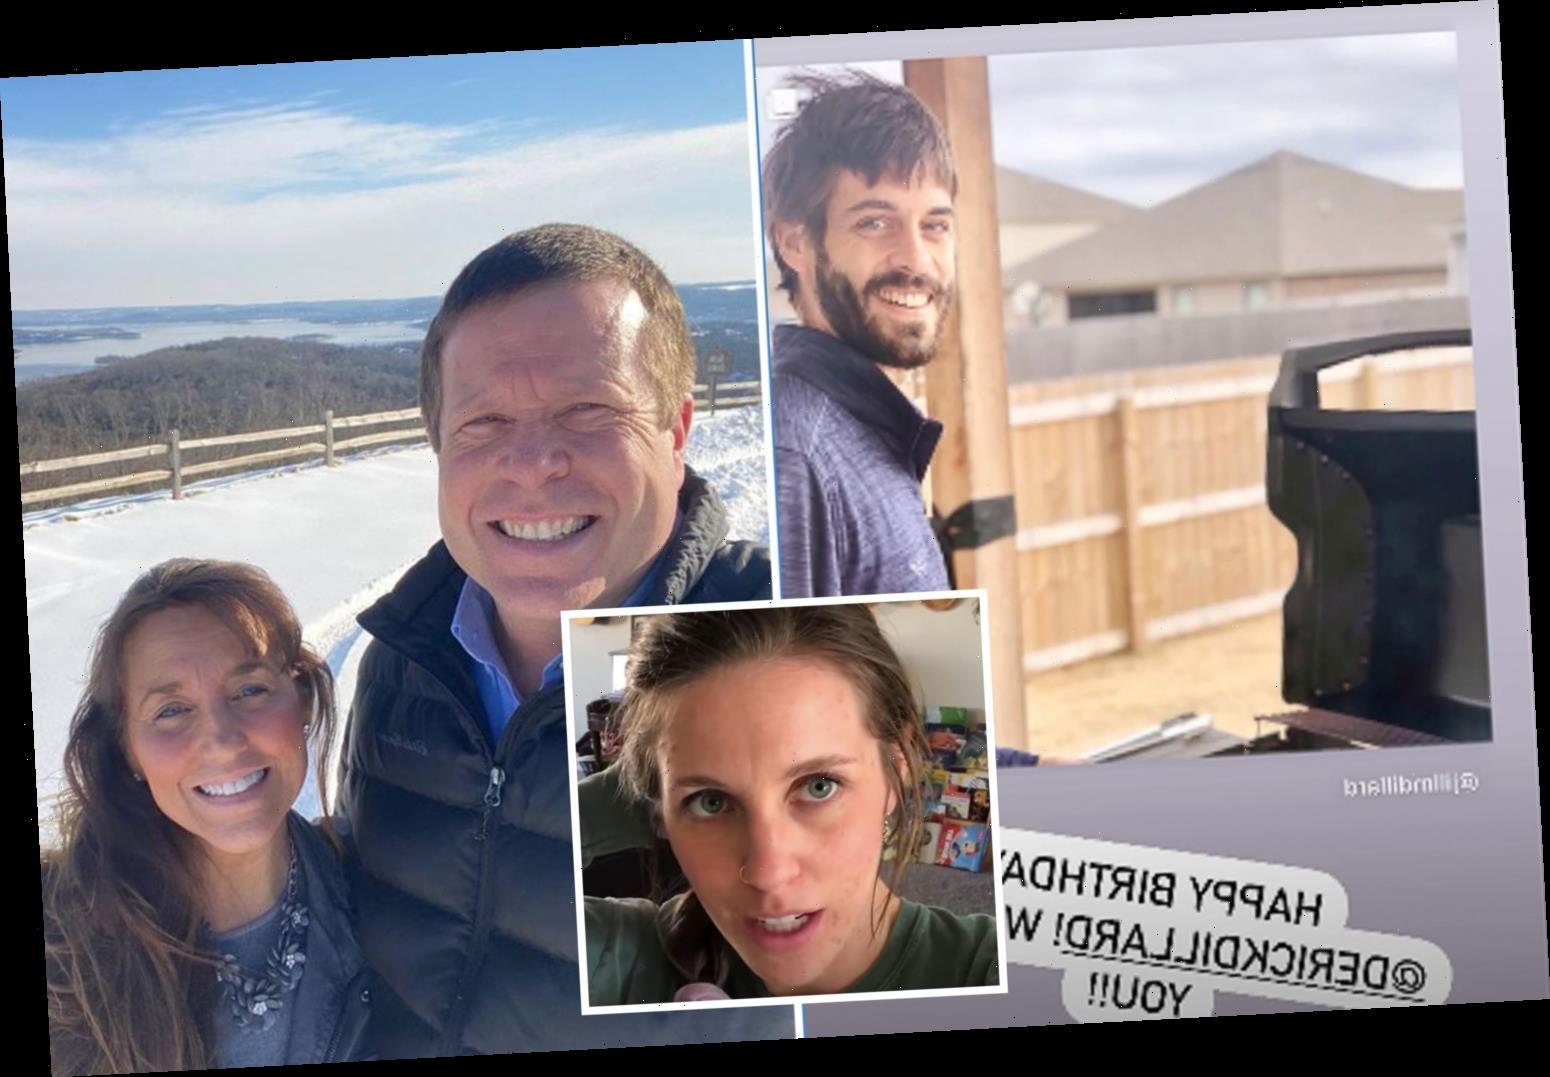 Jim Bob & Michelle Duggar wish estranged daughter Jill's husband Derick a happy birthday & say 'we love you' amid feud